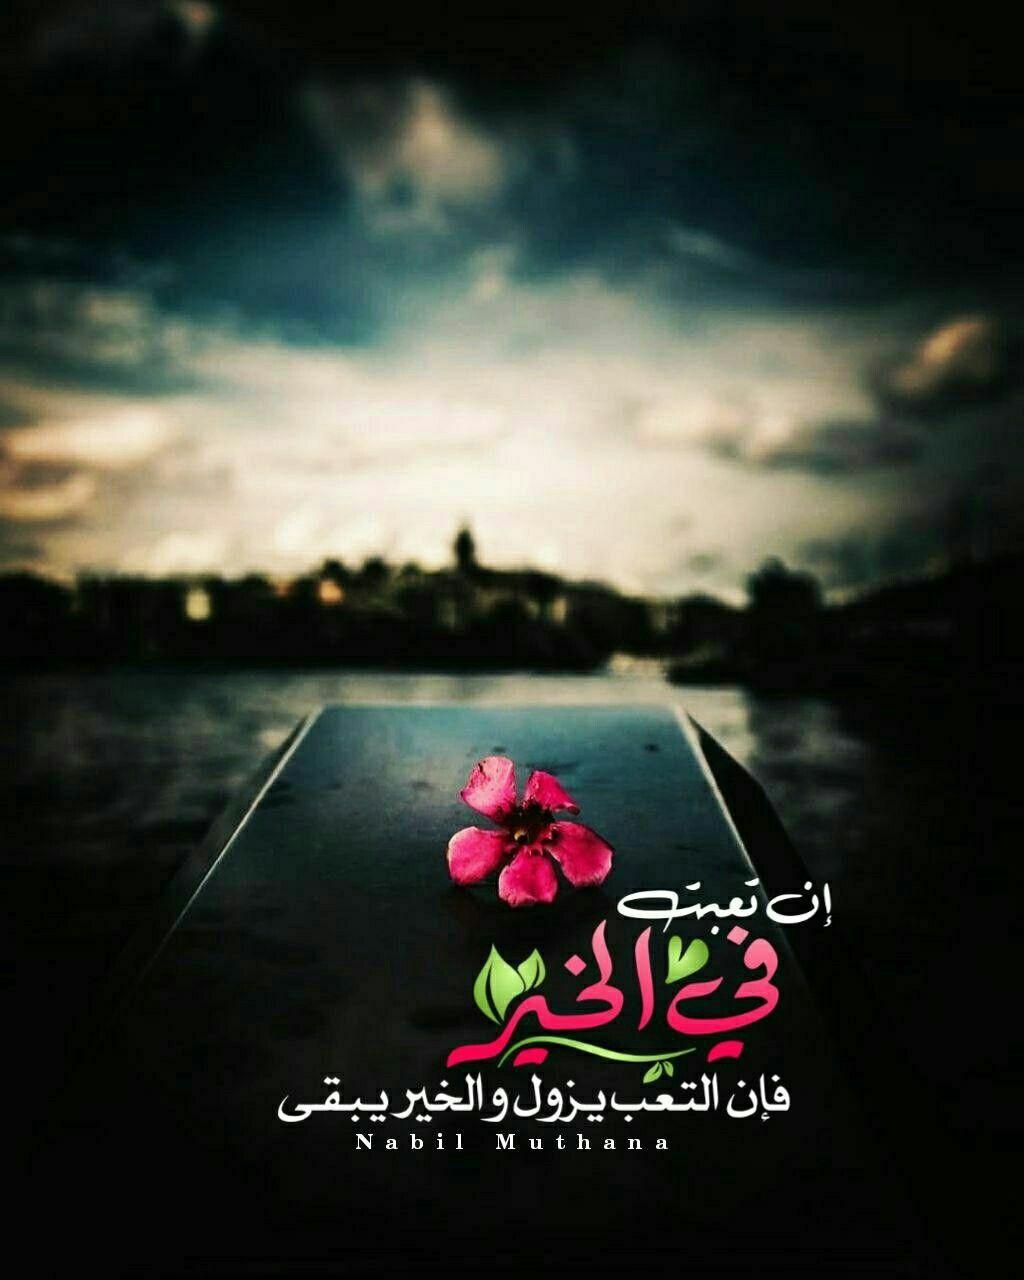 Pin By Souad Berbar On أجيب دعوة الداعي Movie Posters Allah Islam Poster